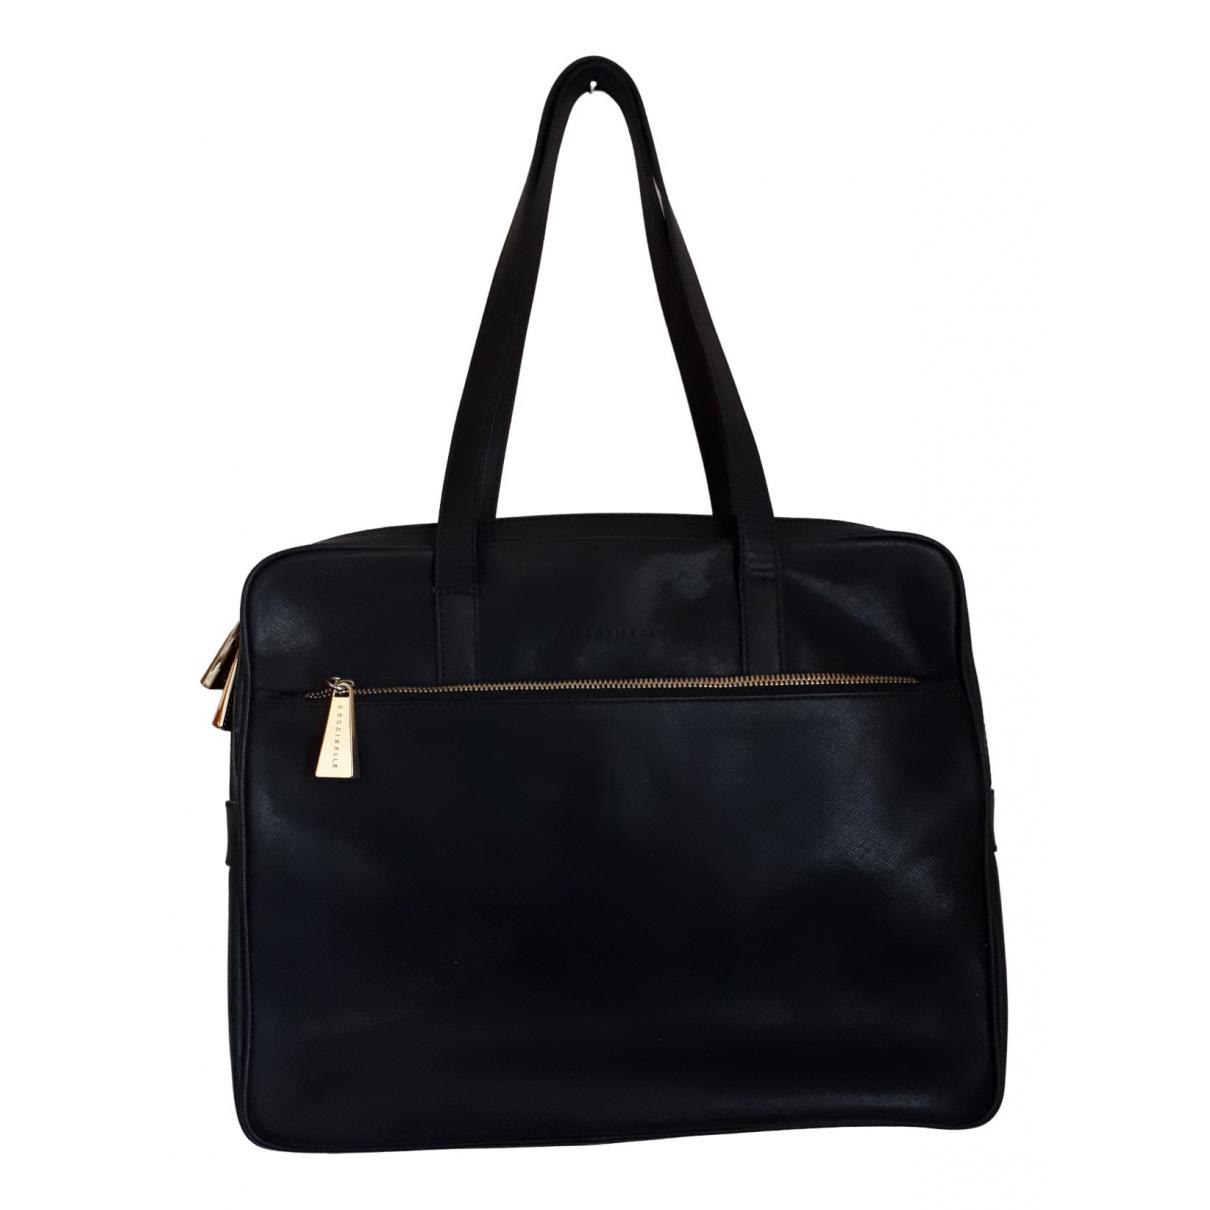 Coccinelle N Black Leather handbag for Women N